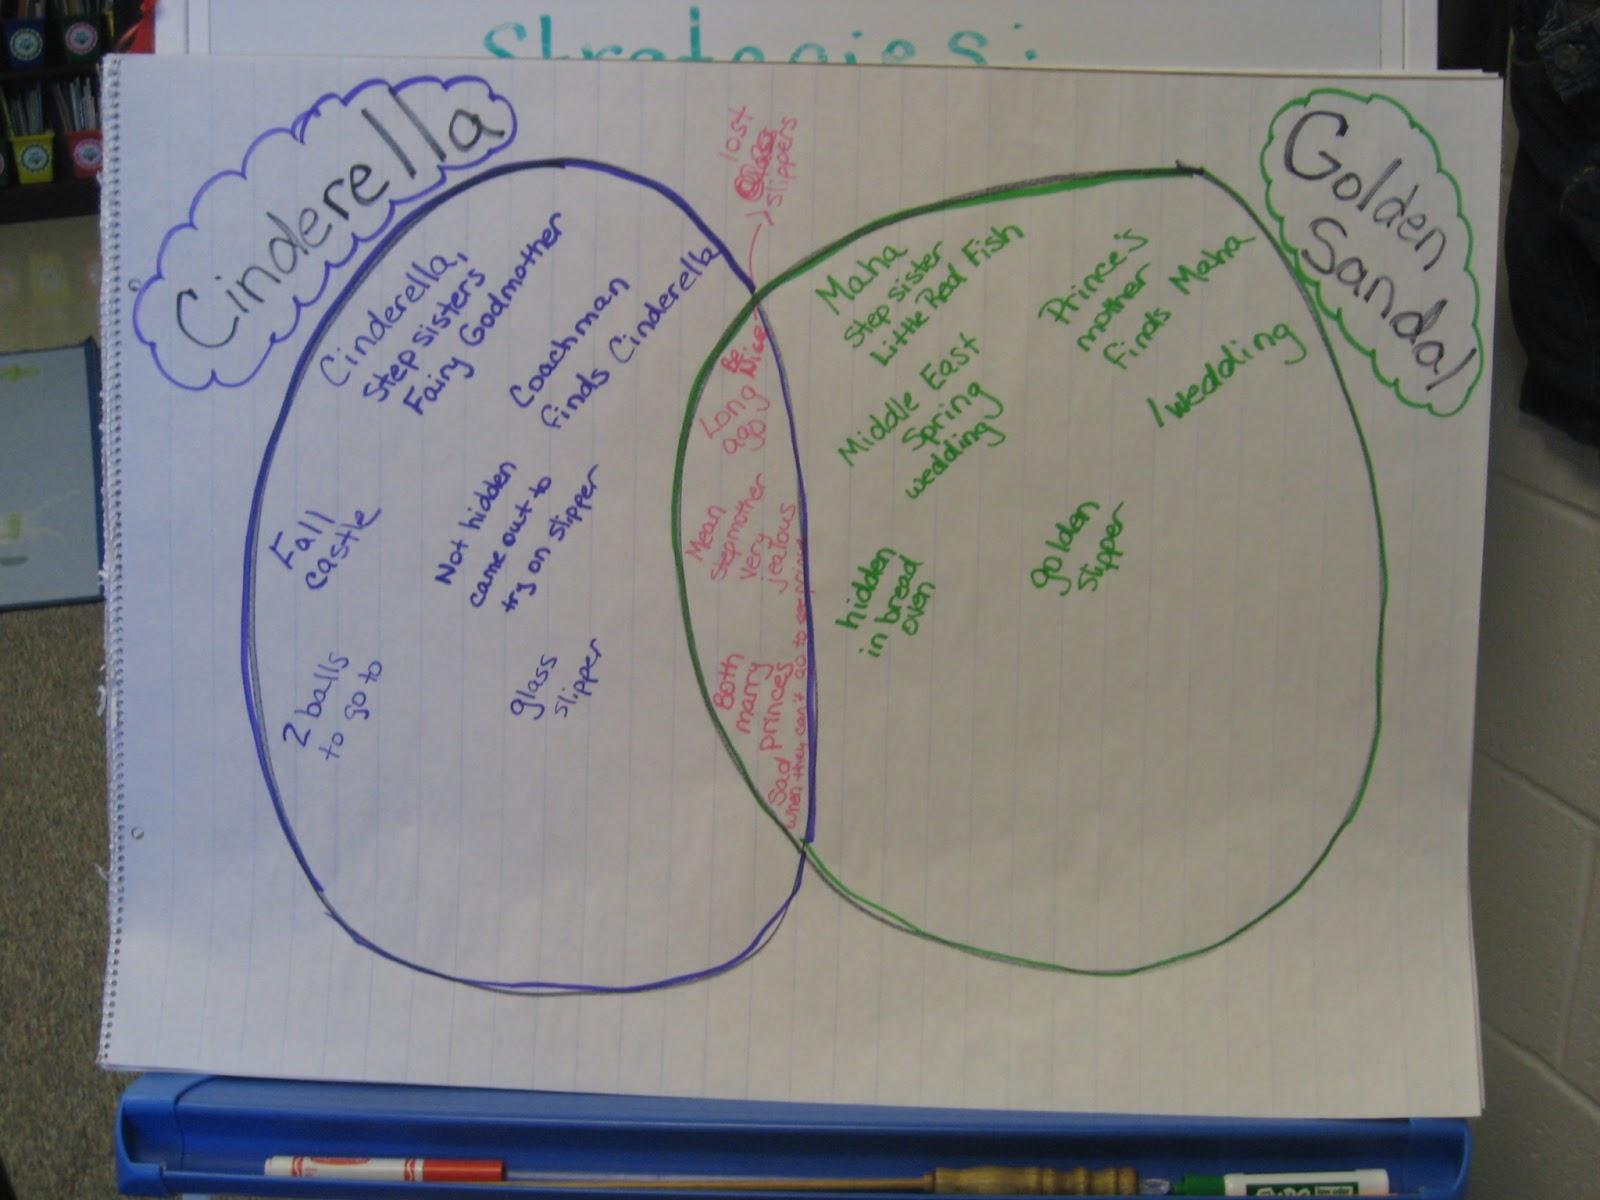 Cendrillon Venn Diagram Uml Class Online Shopping System Essay Conclusion Writing Help For College And High School Essays William Morris Cinderella Tile Designed By Sir Edward Burne Jones Slideshare